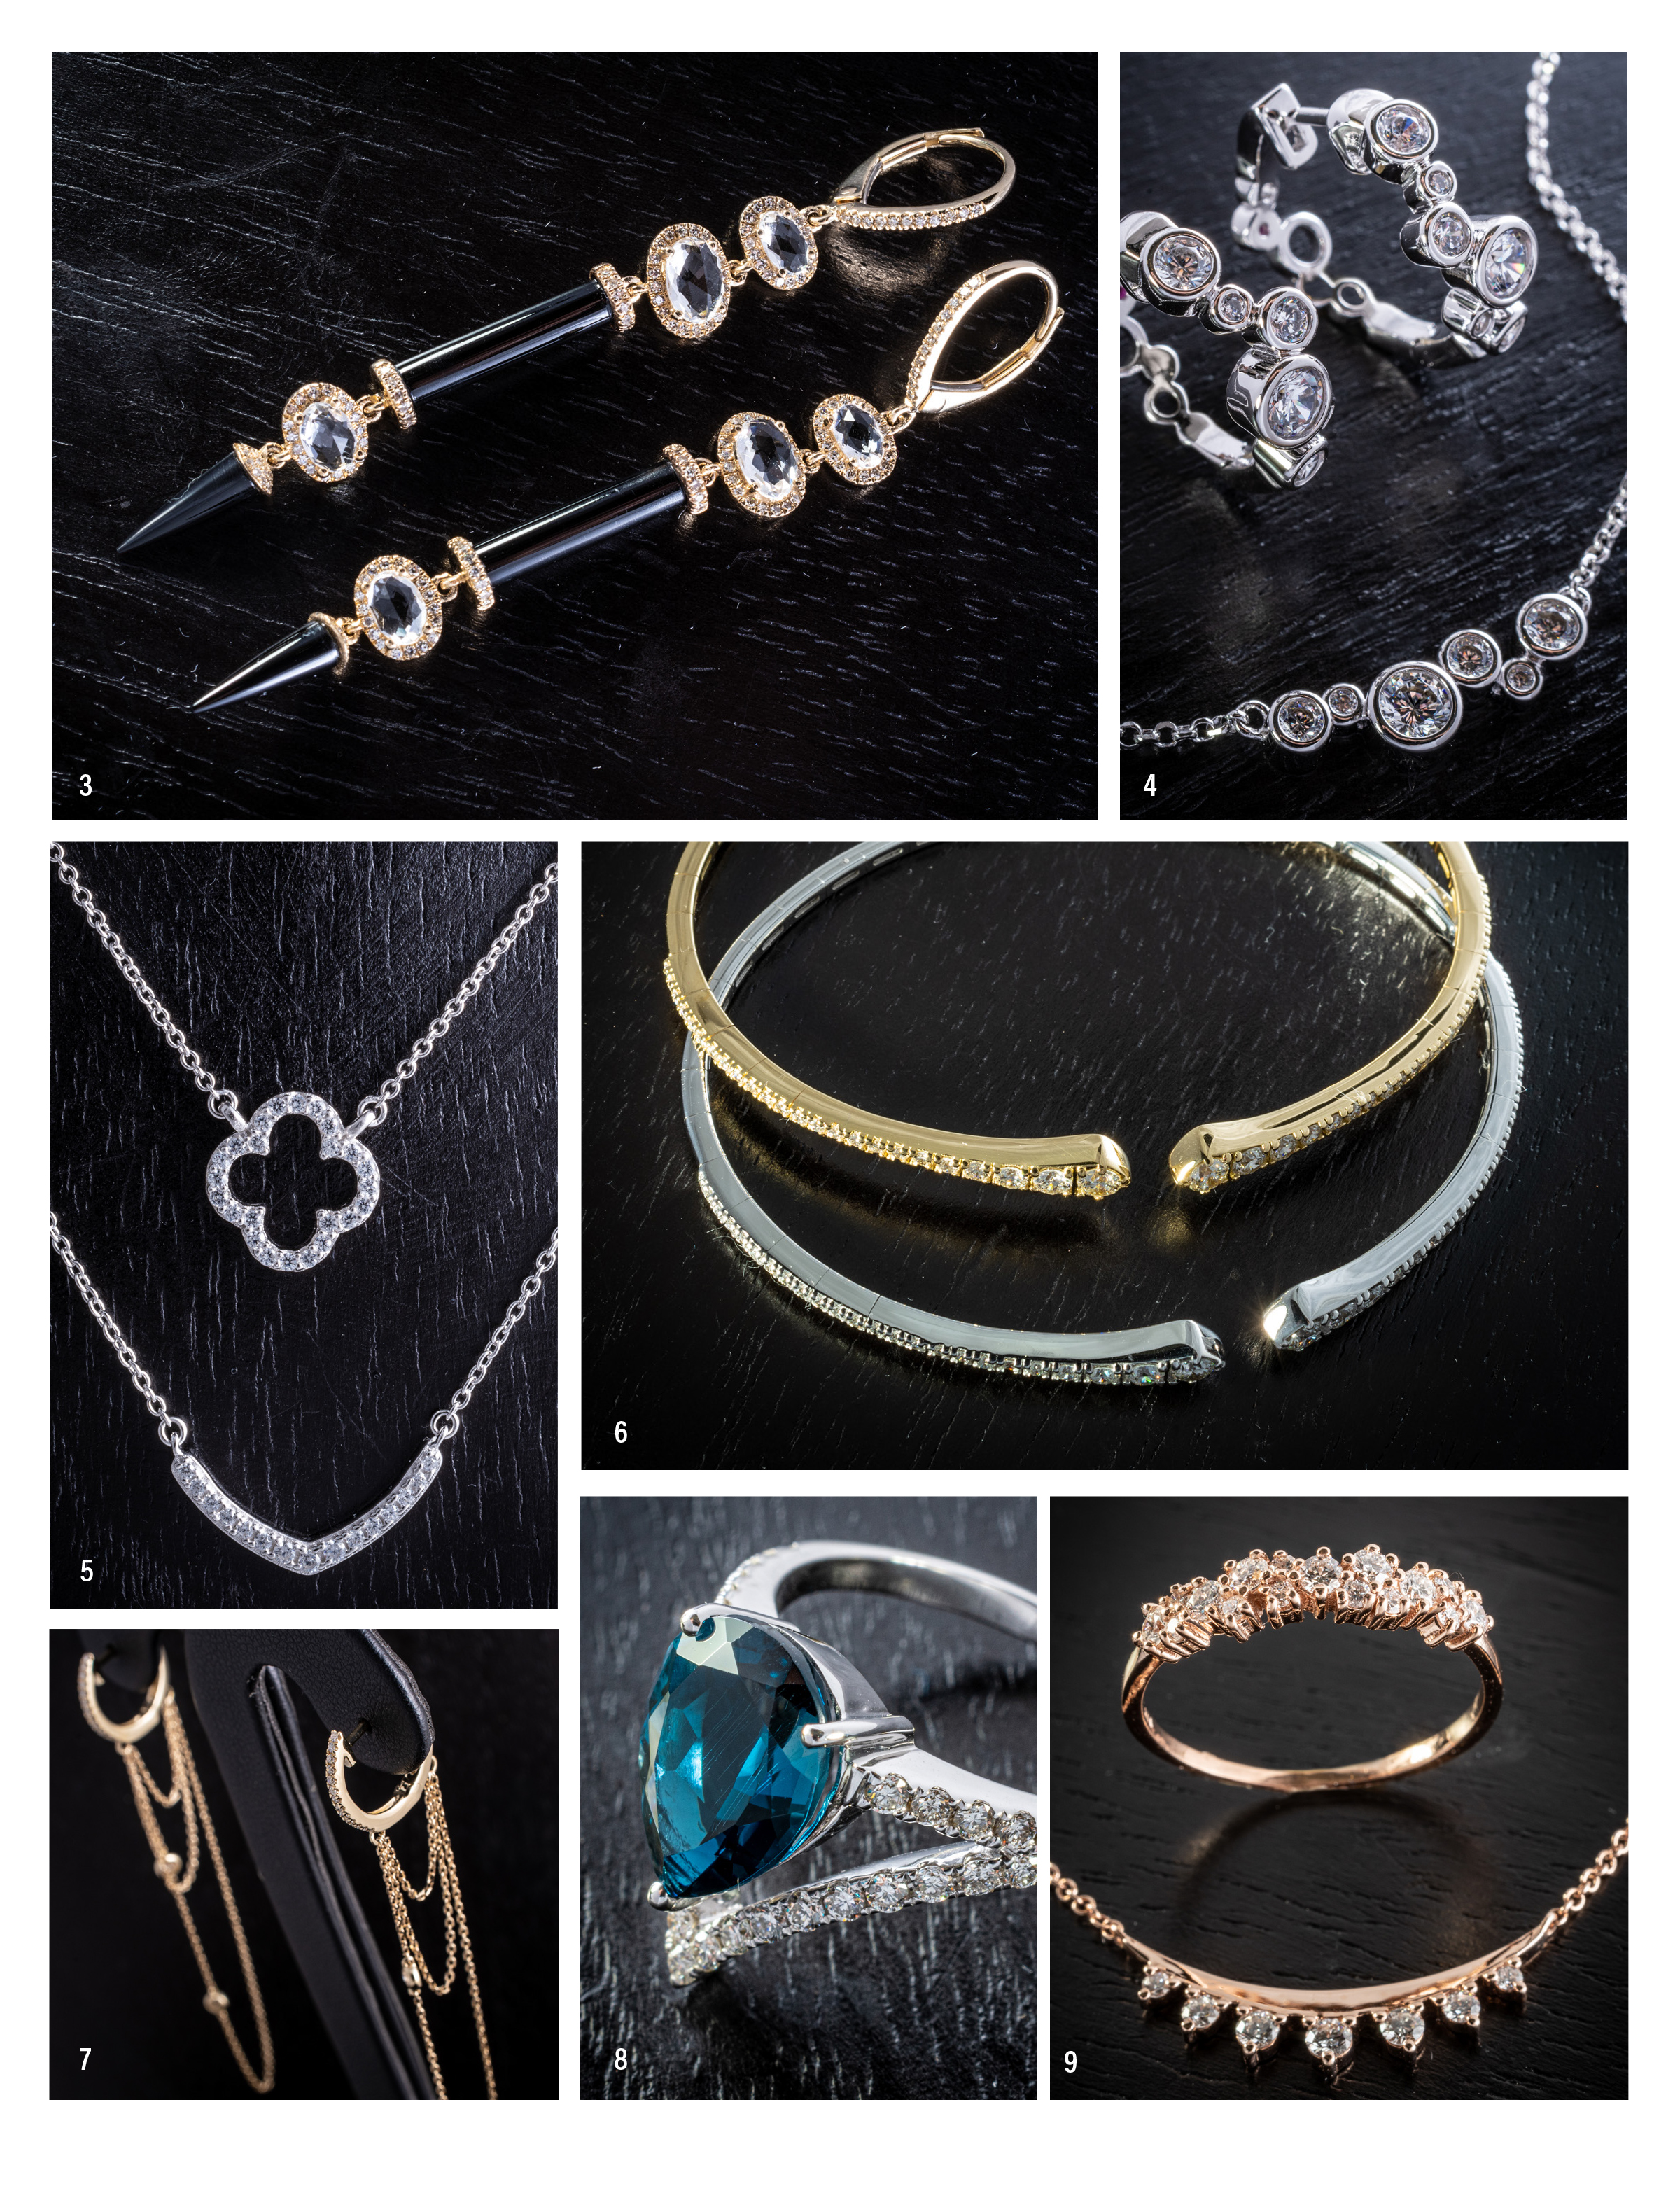 Susan Bella Jewelry image 2